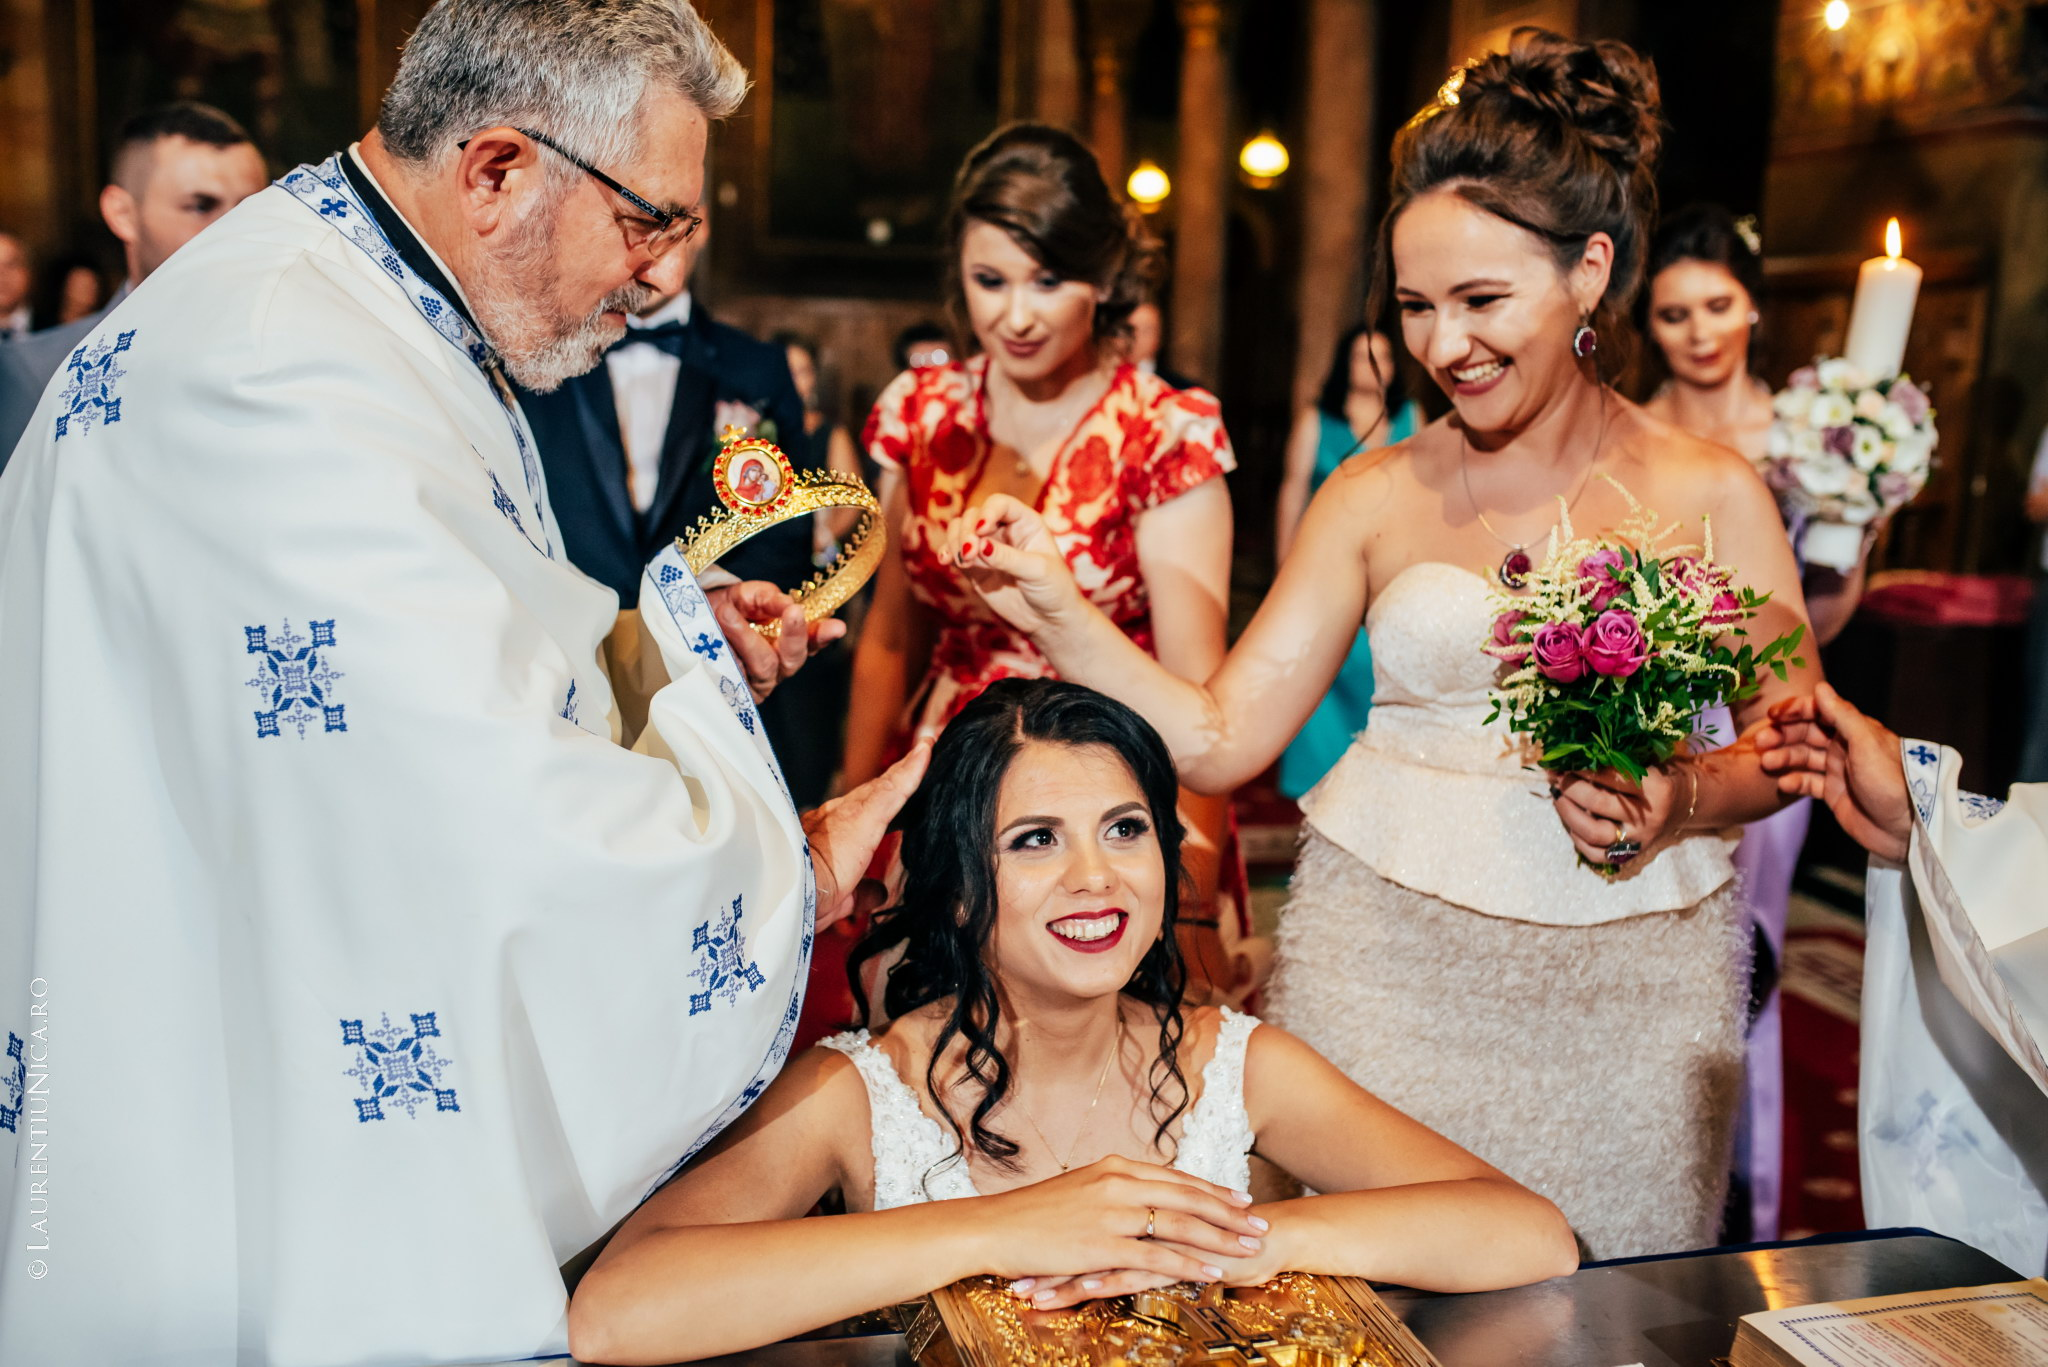 fotografii nunta craiova bia alex fotograf nunta laurentiu nica 39 - Bia & Alex | Fotografii nunta | Craiova